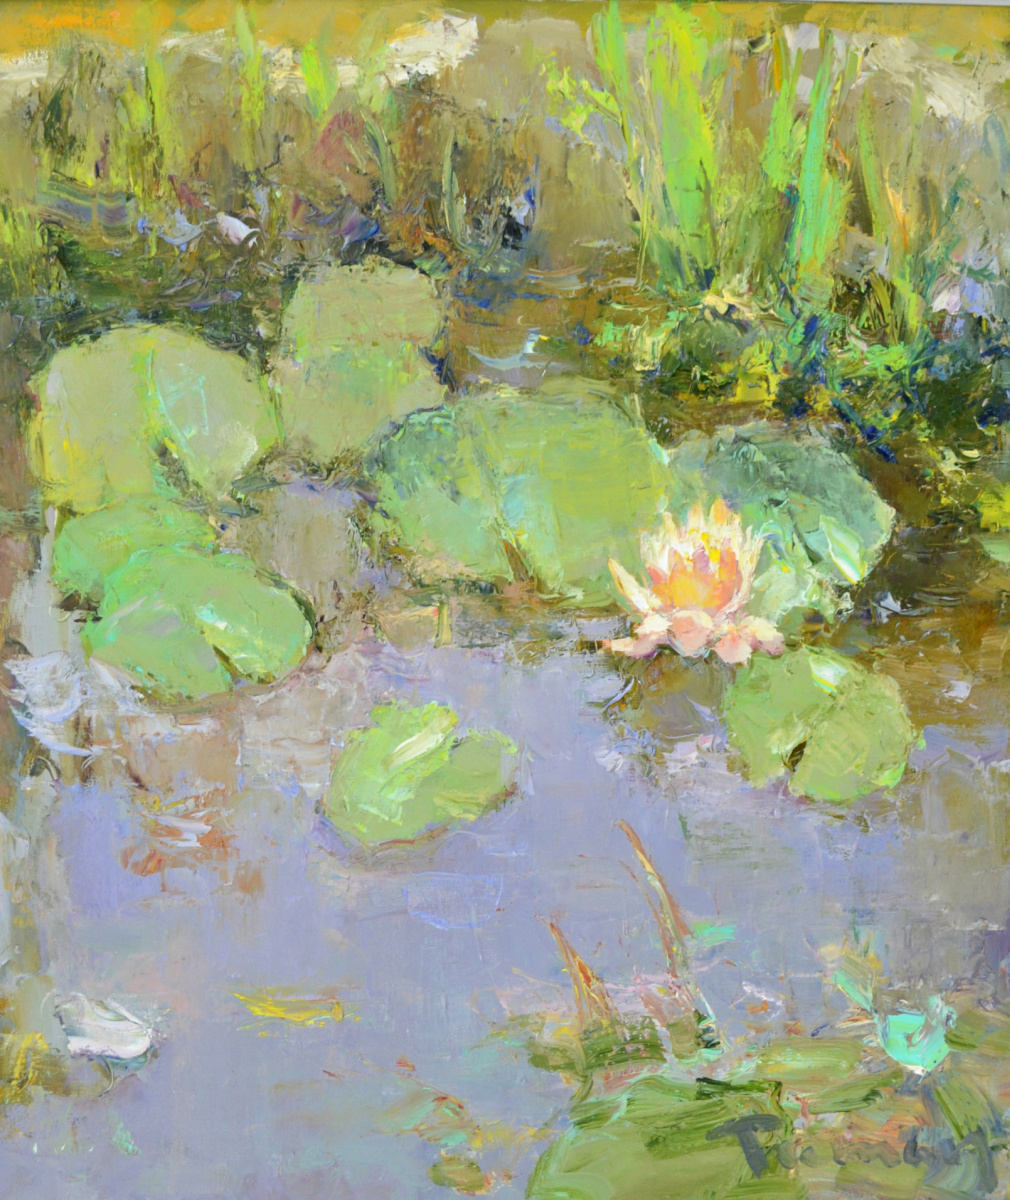 Tuman Art Gallery Tumana Zhumabayeva. From the lotus series